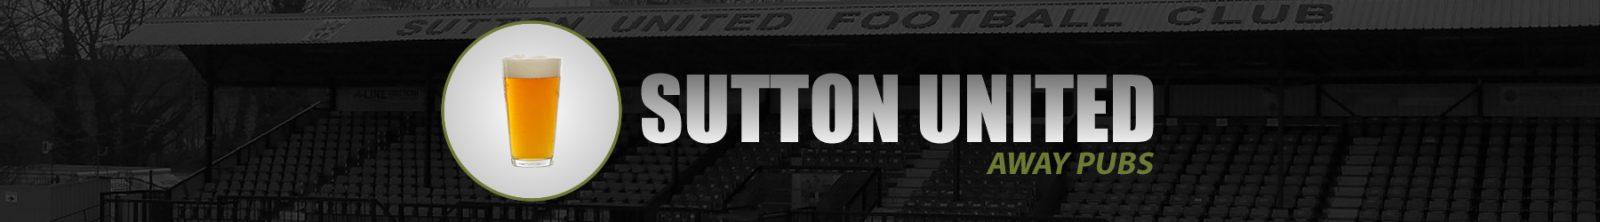 Sutton United Away Pubs